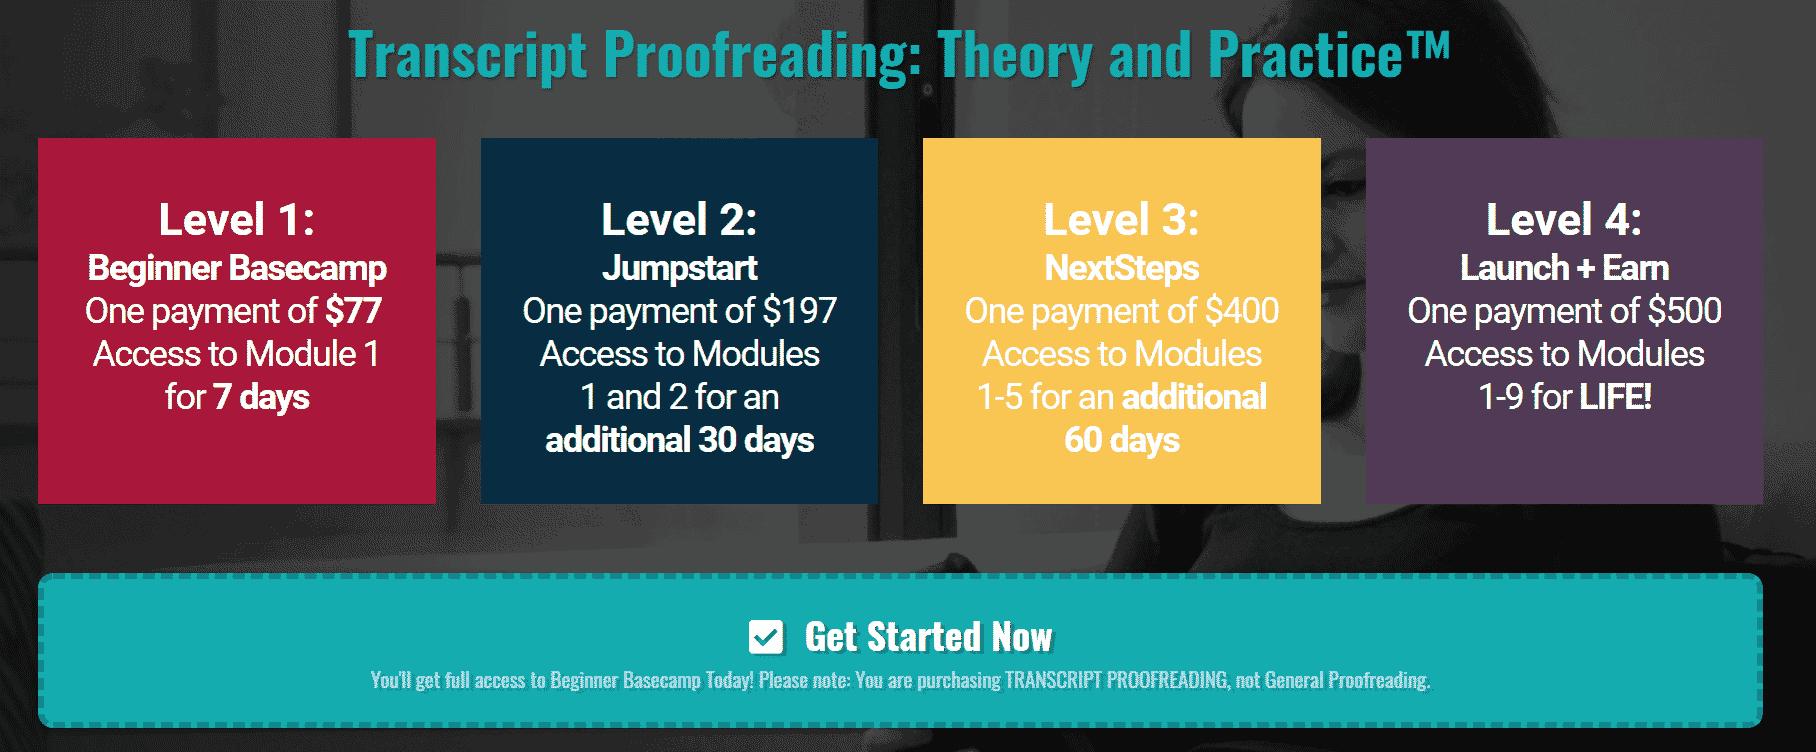 Transcript Proofreading Modules & Levels